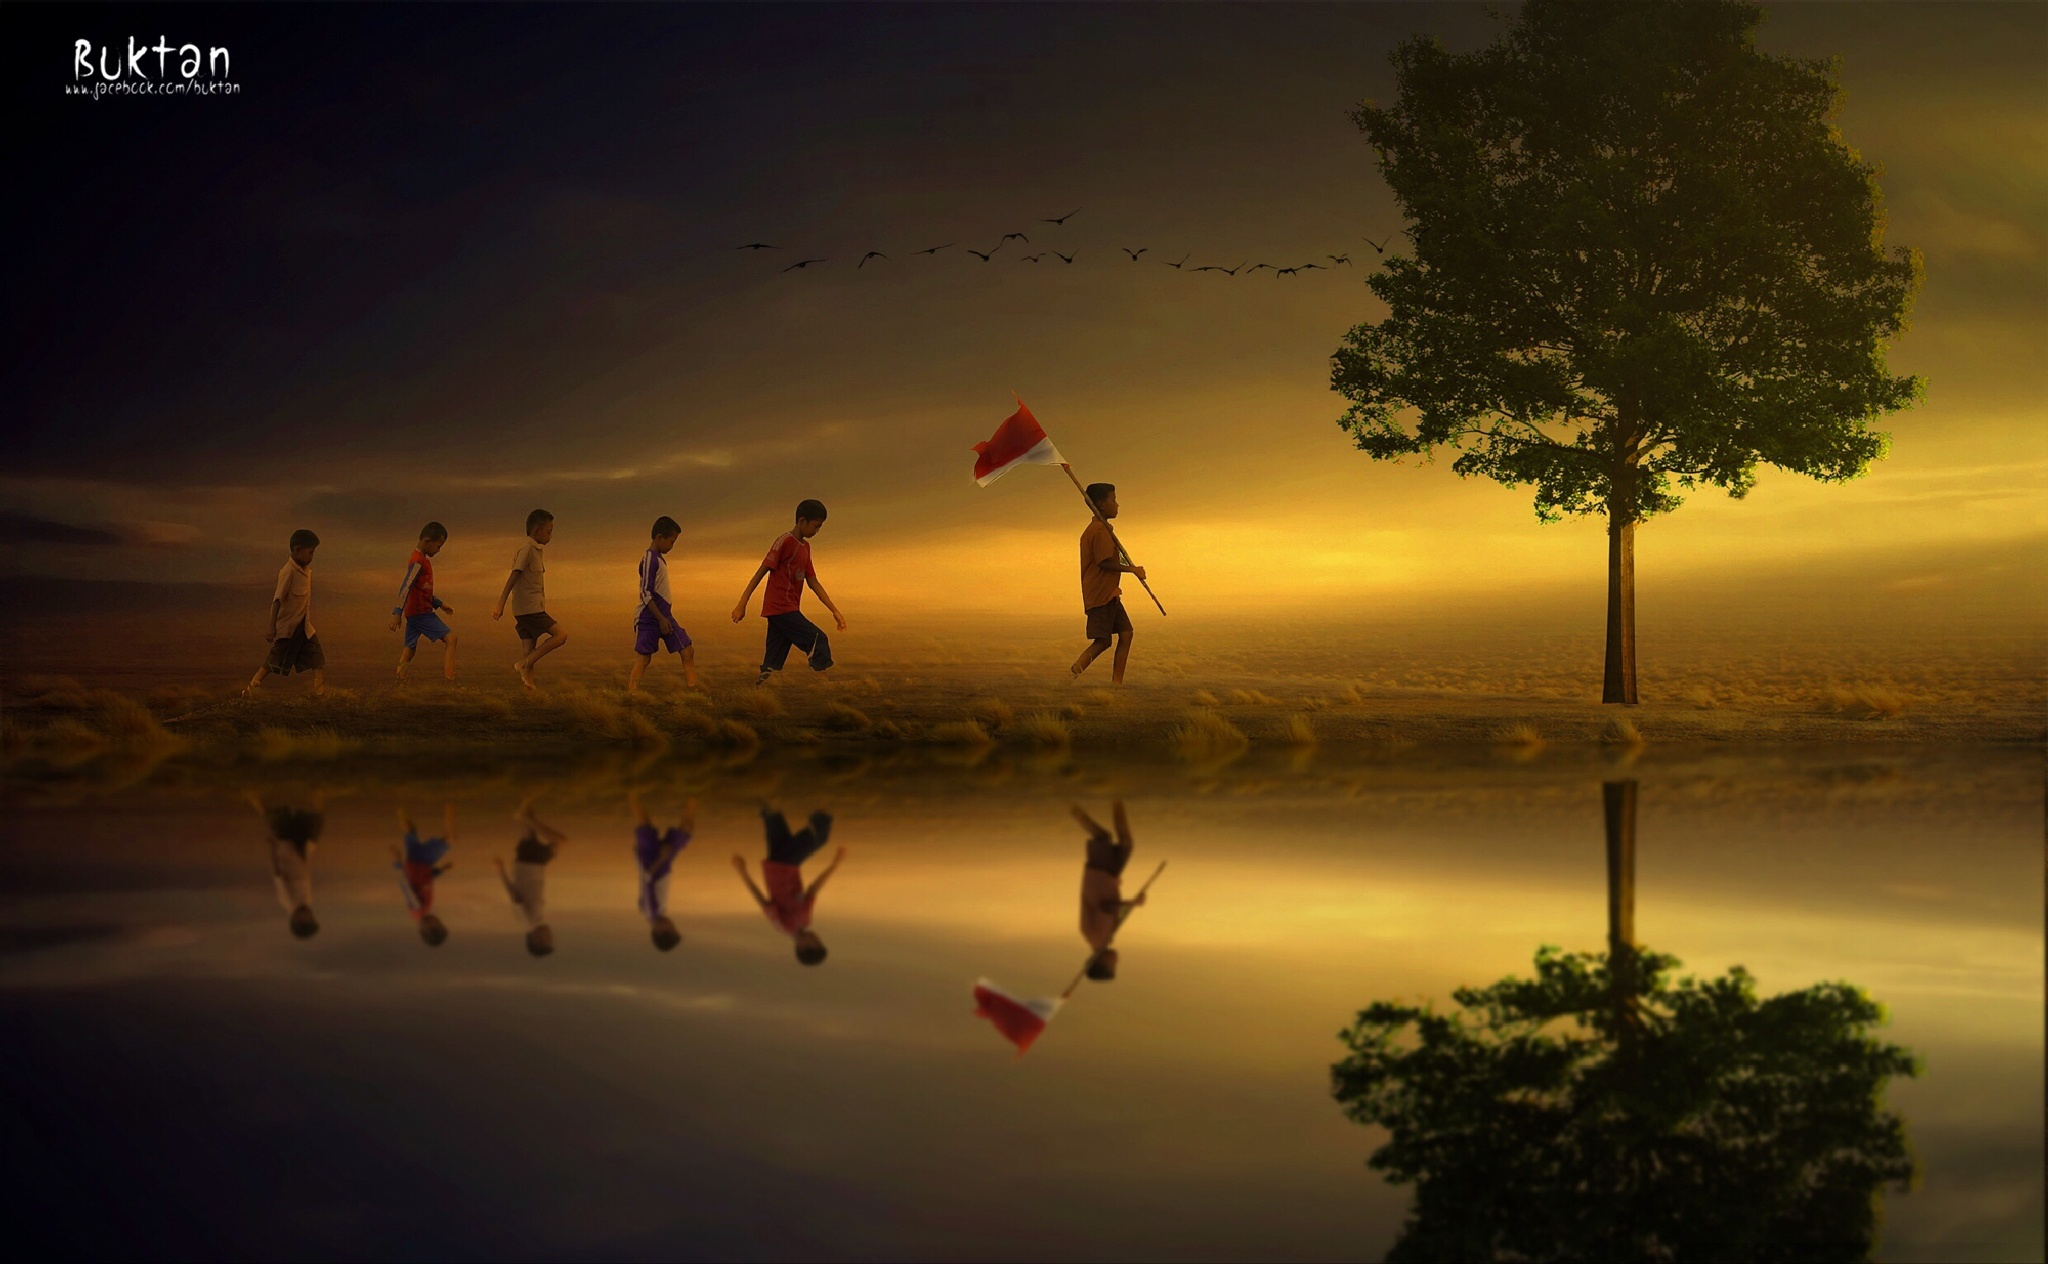 Untitled by Buktan Hummen